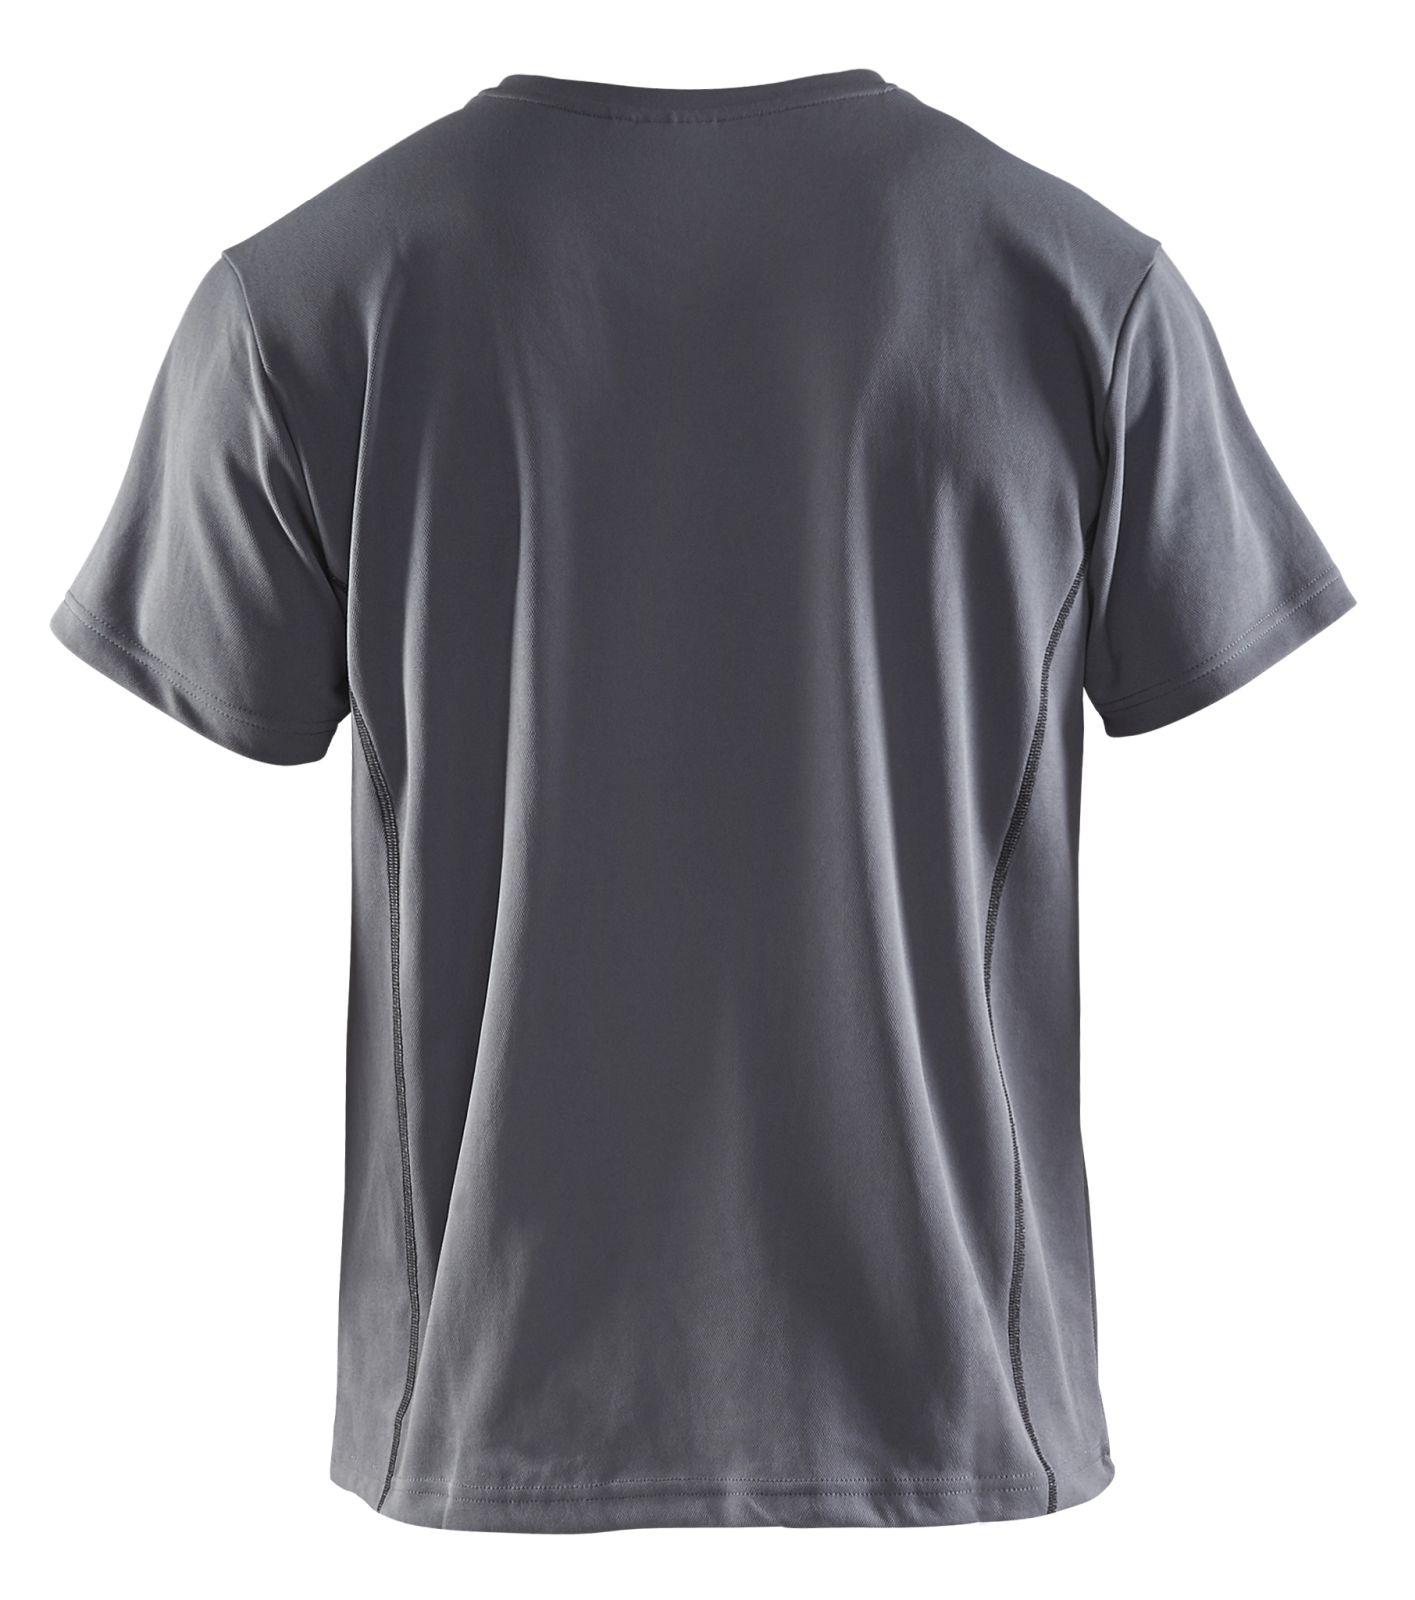 Blaklader T-shirts 33231051 grijs(9400)